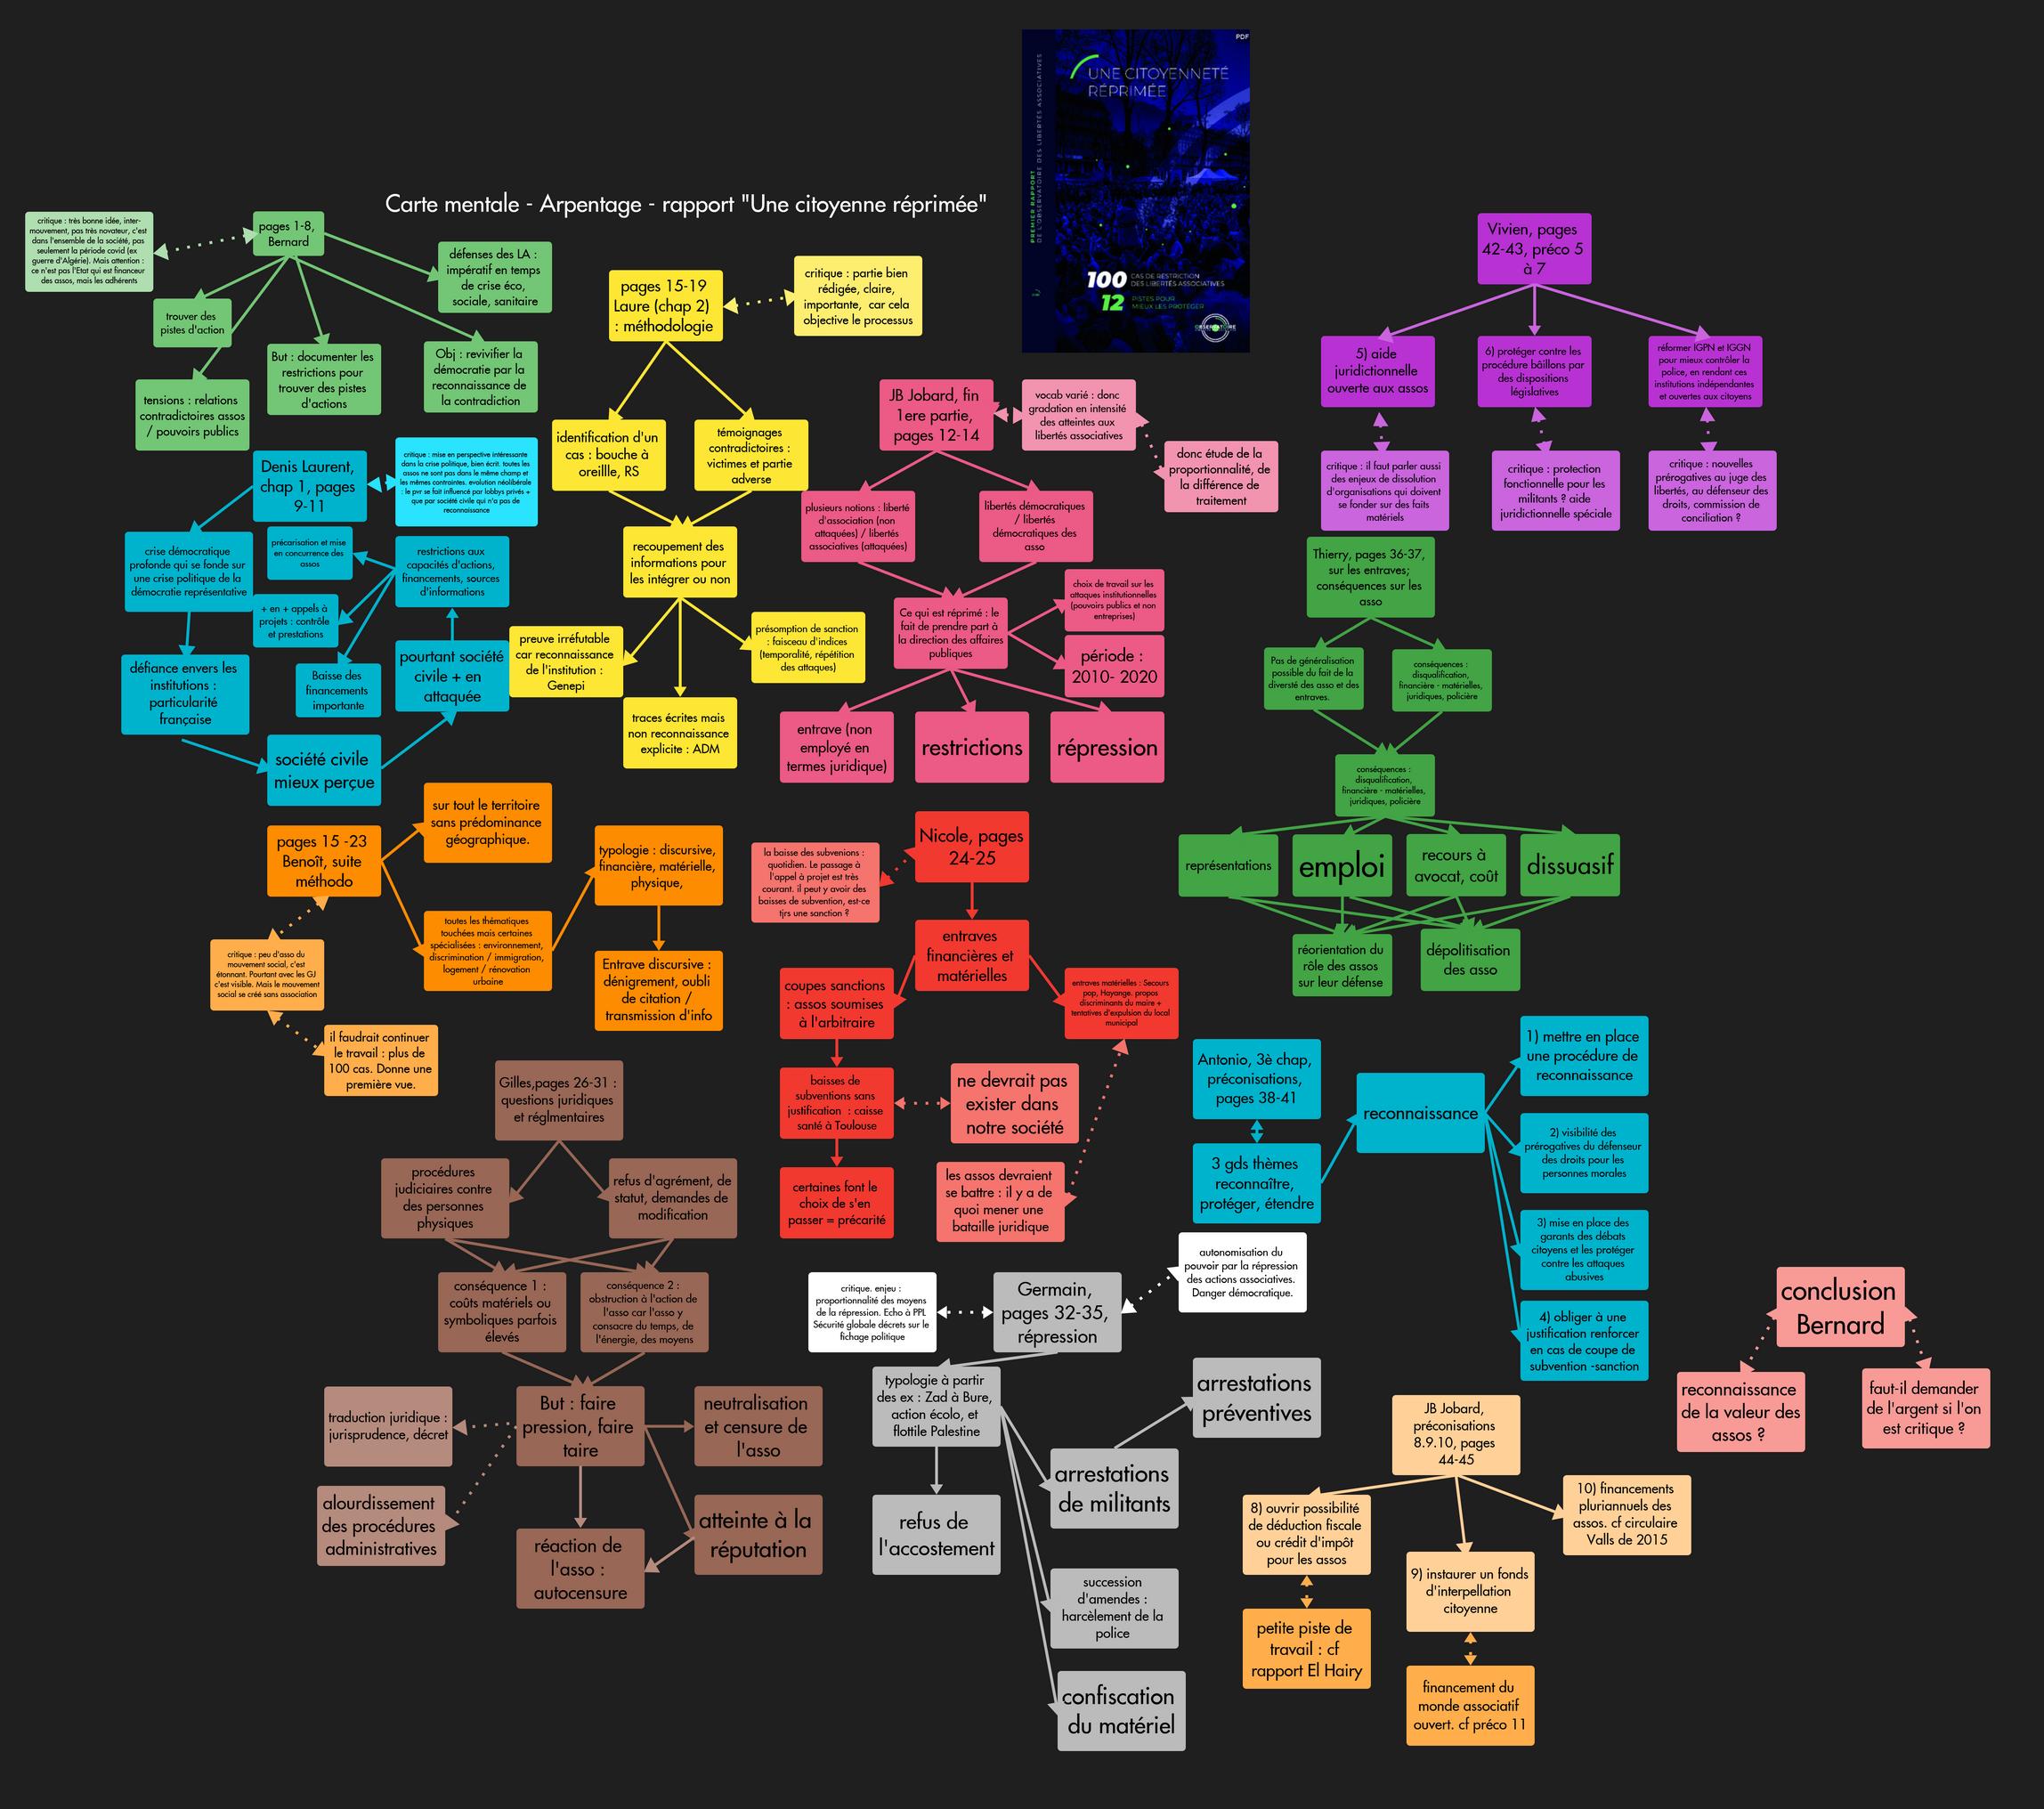 image Arpentage__Rapport_bis__Liberts_associatives_entier.png (1.5MB)